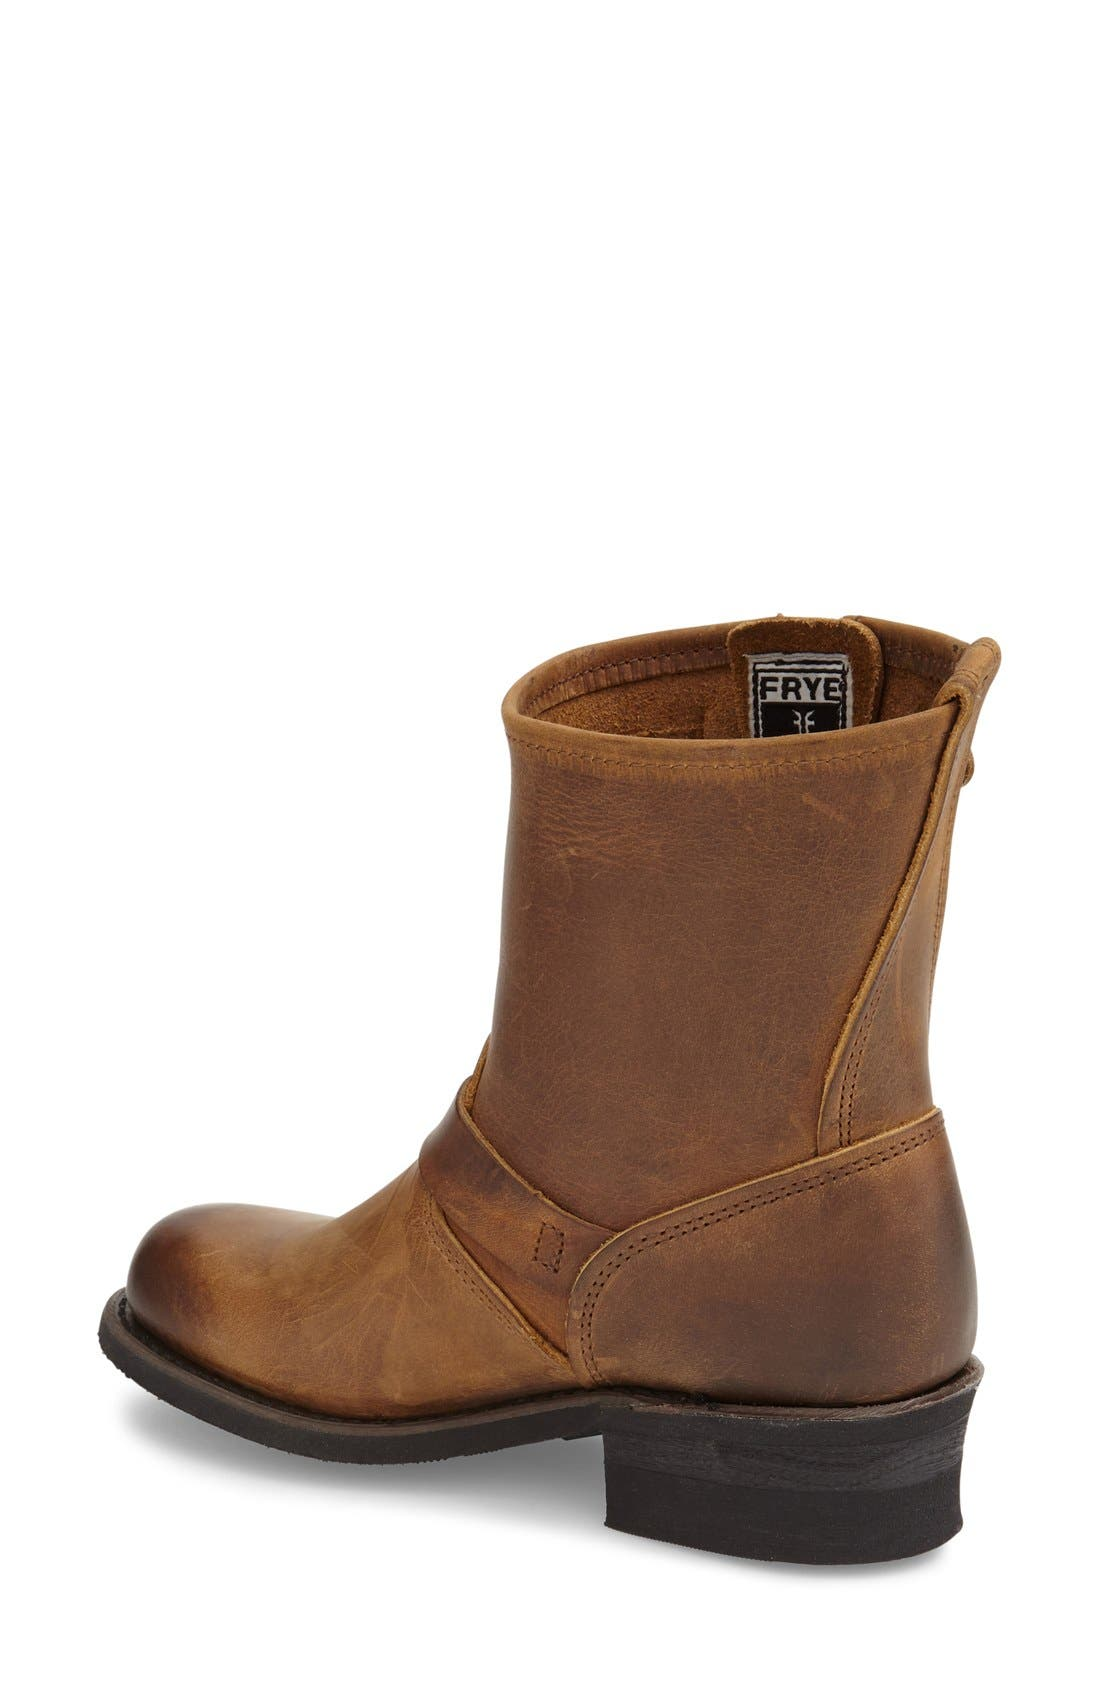 Alternate Image 2  - Frye 'Engineer 8R' Leather Boot (Women)